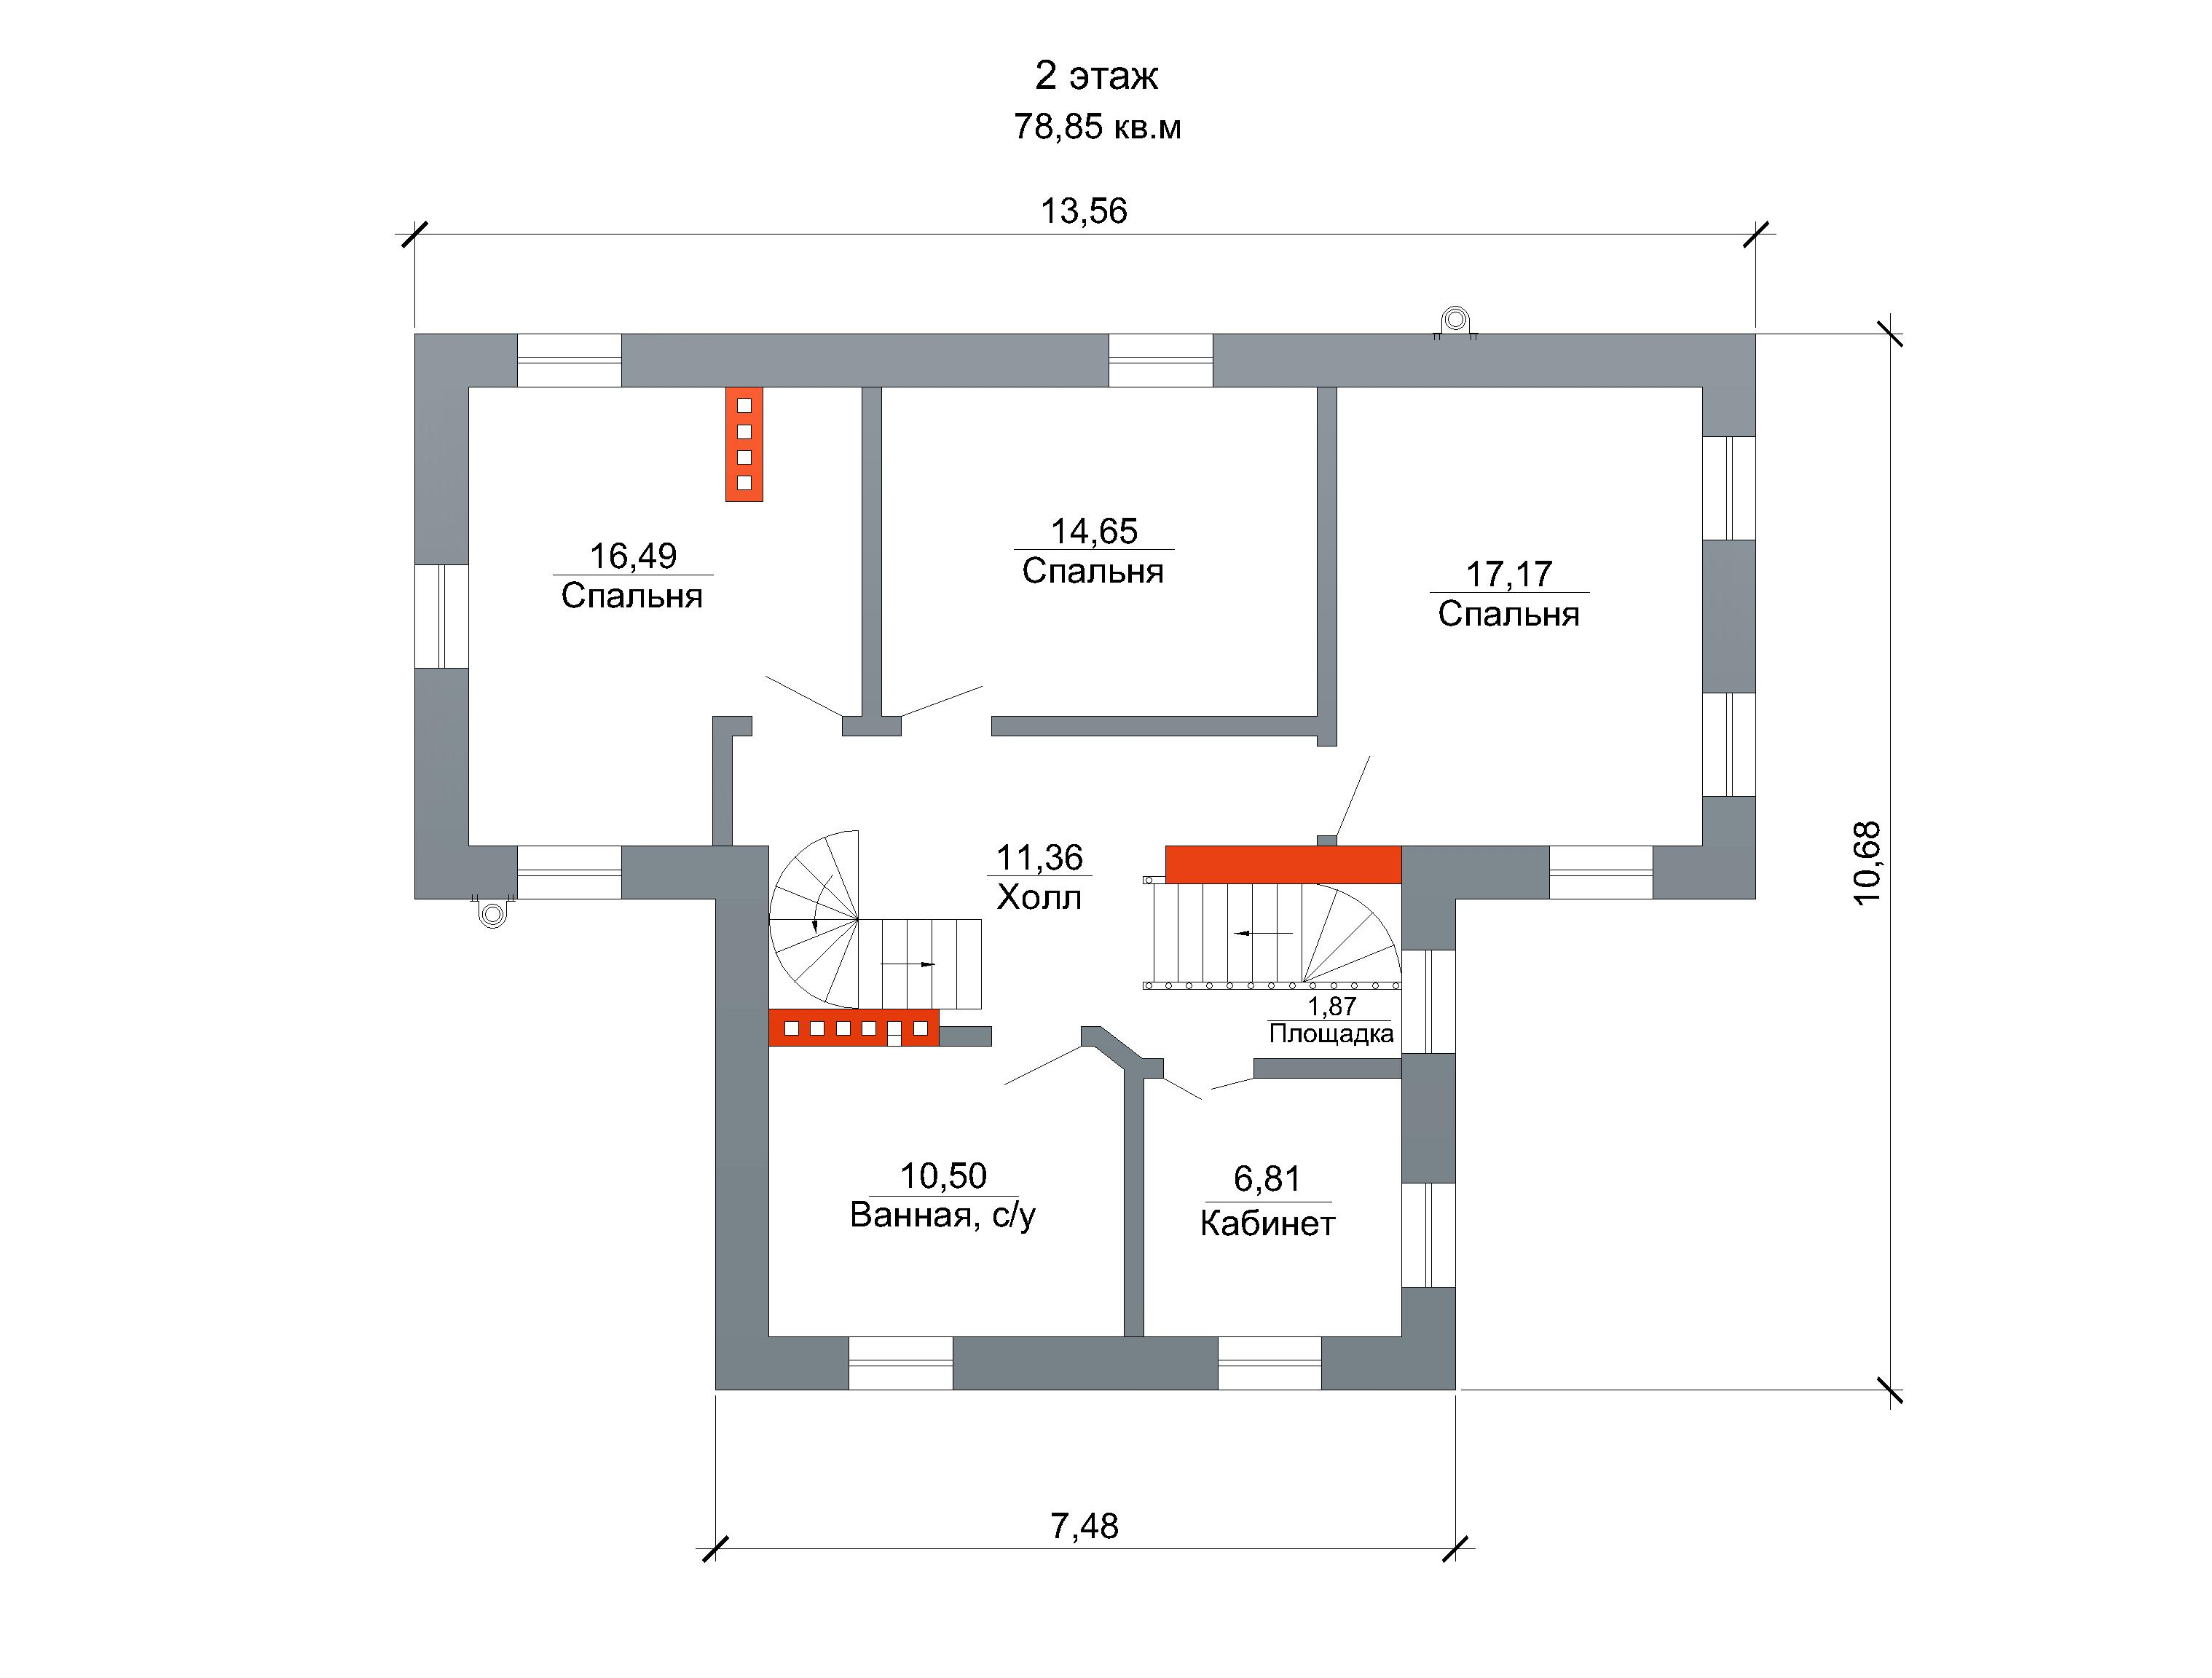 Готовый проект коттеджа 212 м2 / Артикул FP3 план